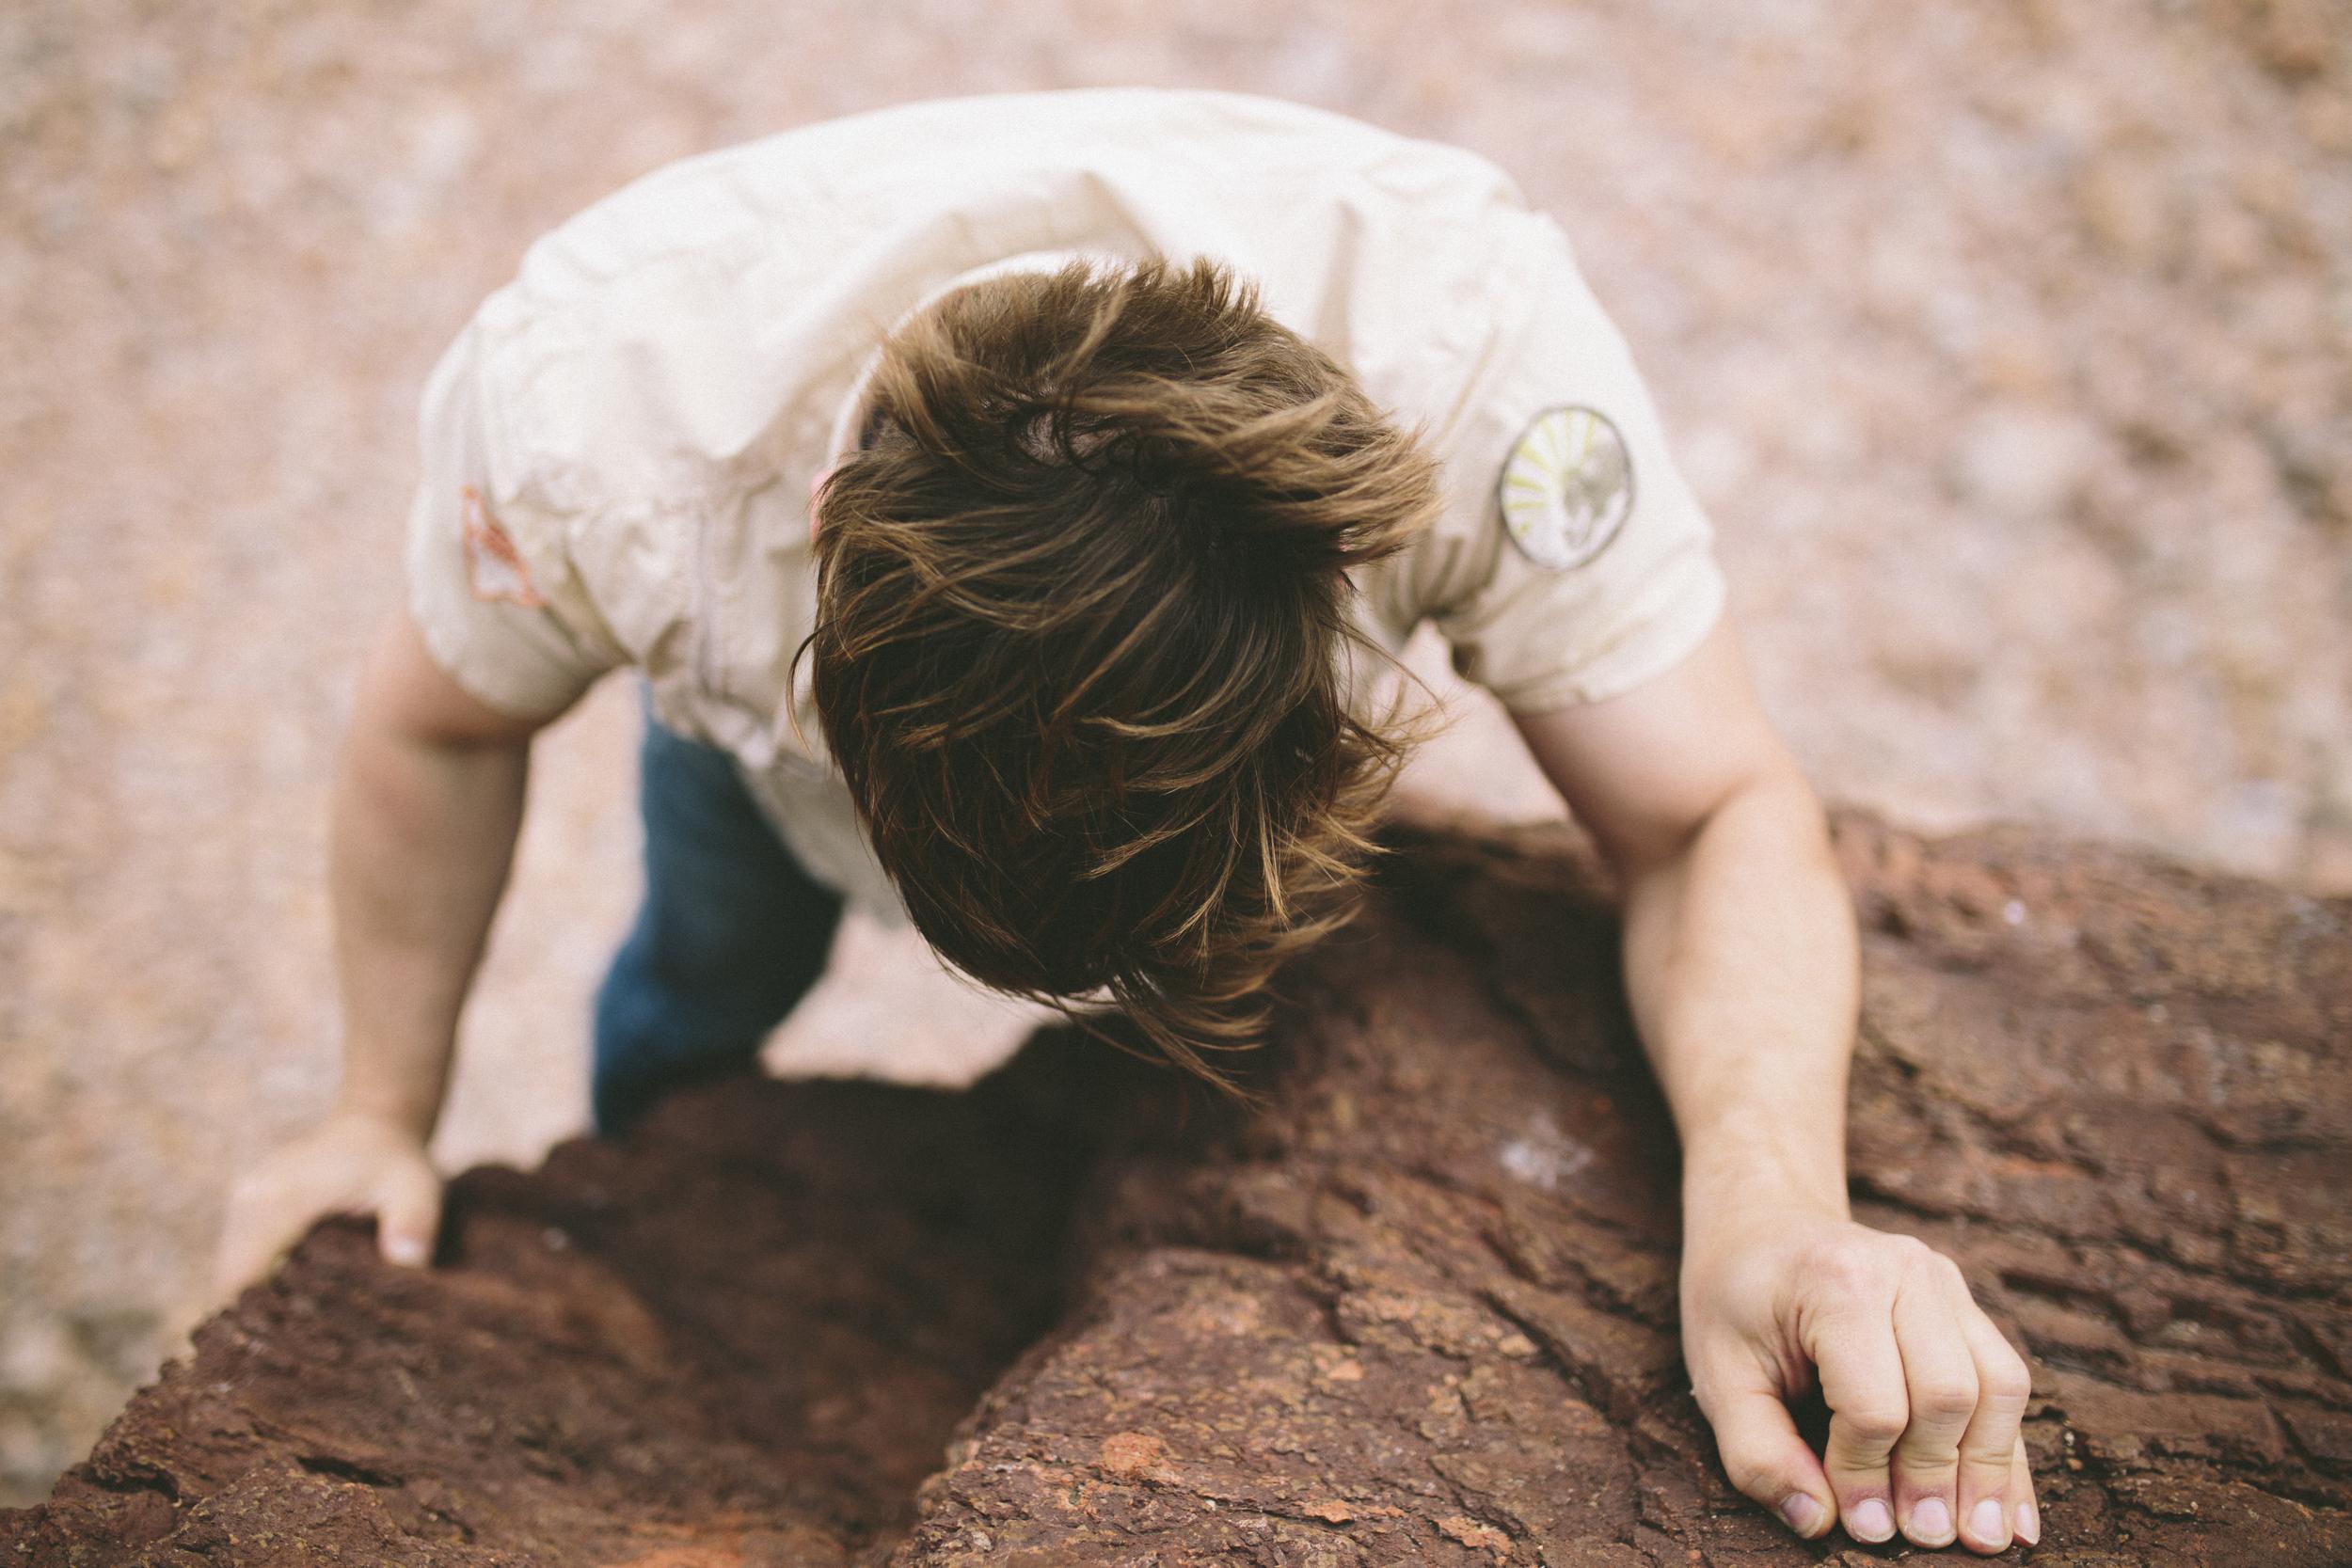 Brandon cliff climbing